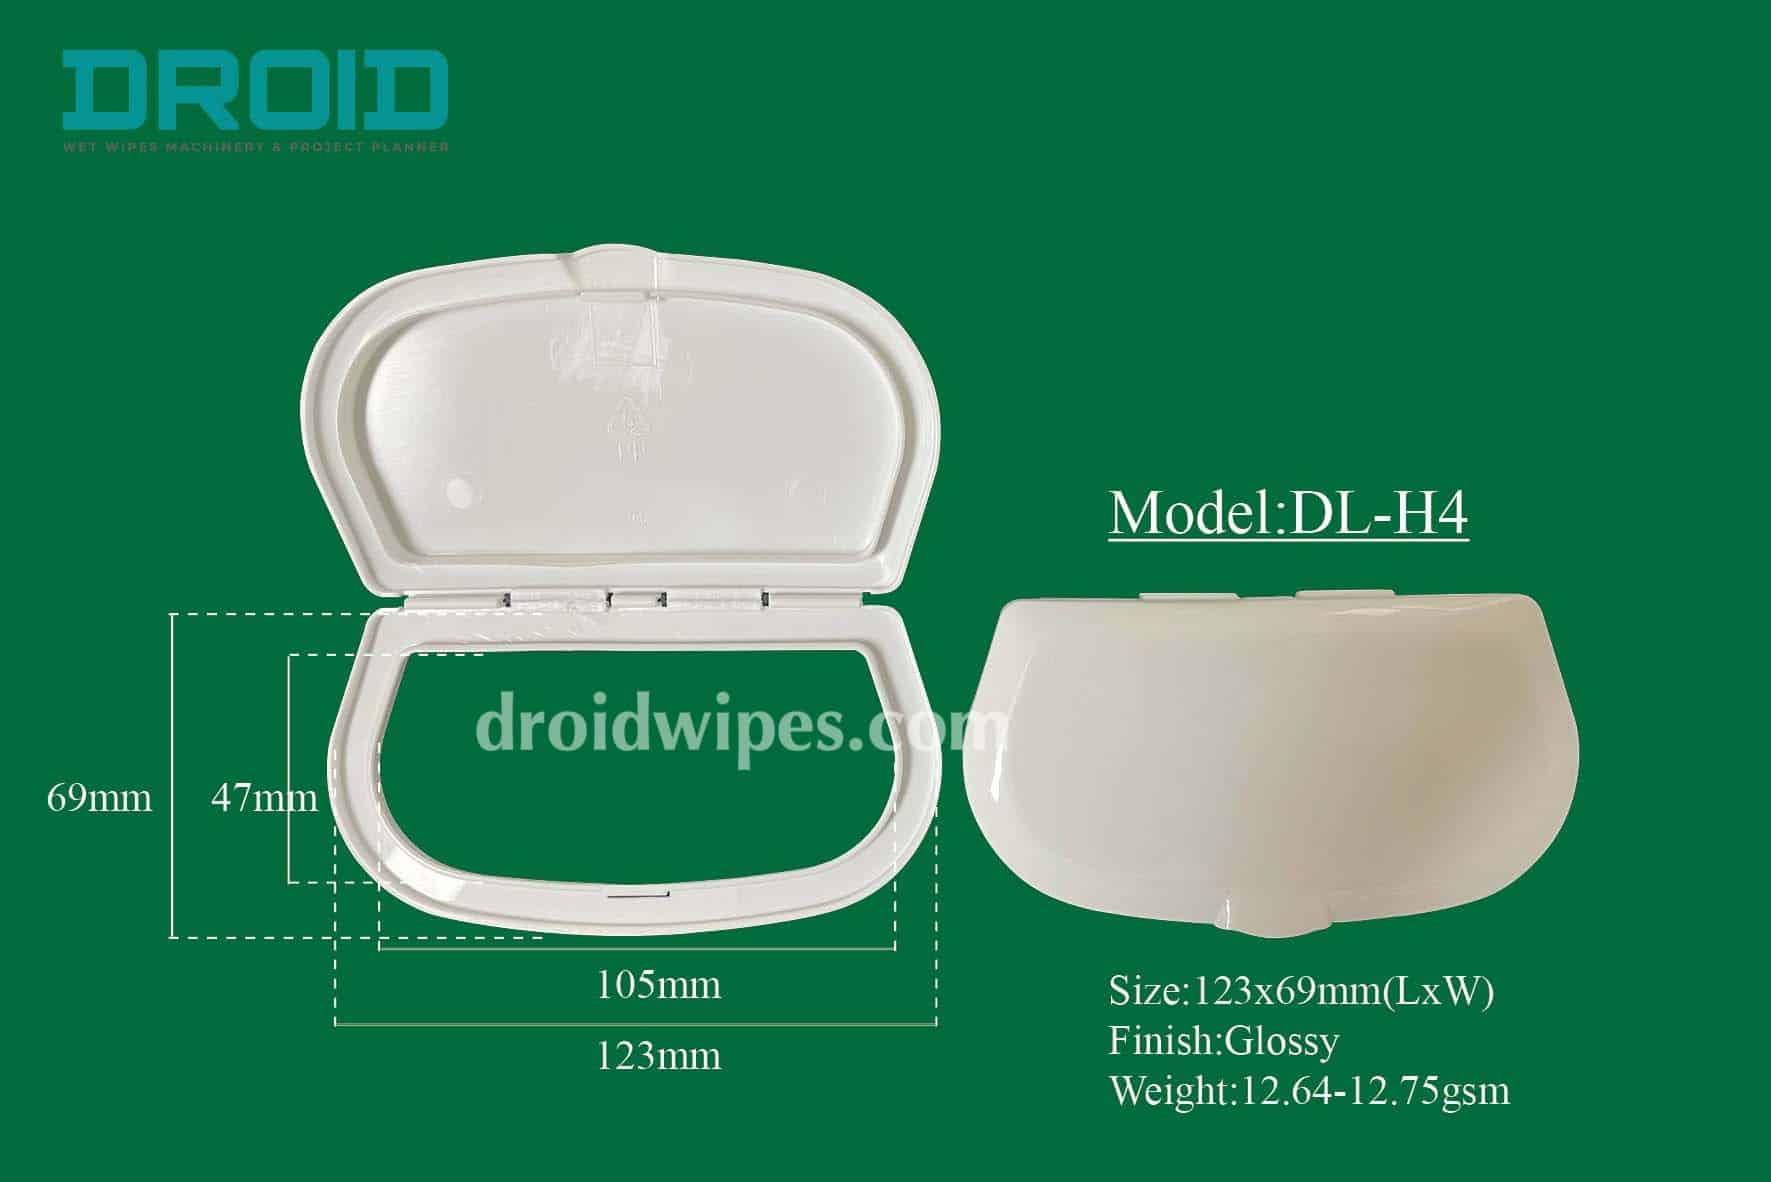 Plastic lid for wet wipes 3 - Plastic Lid for Wet Wipes